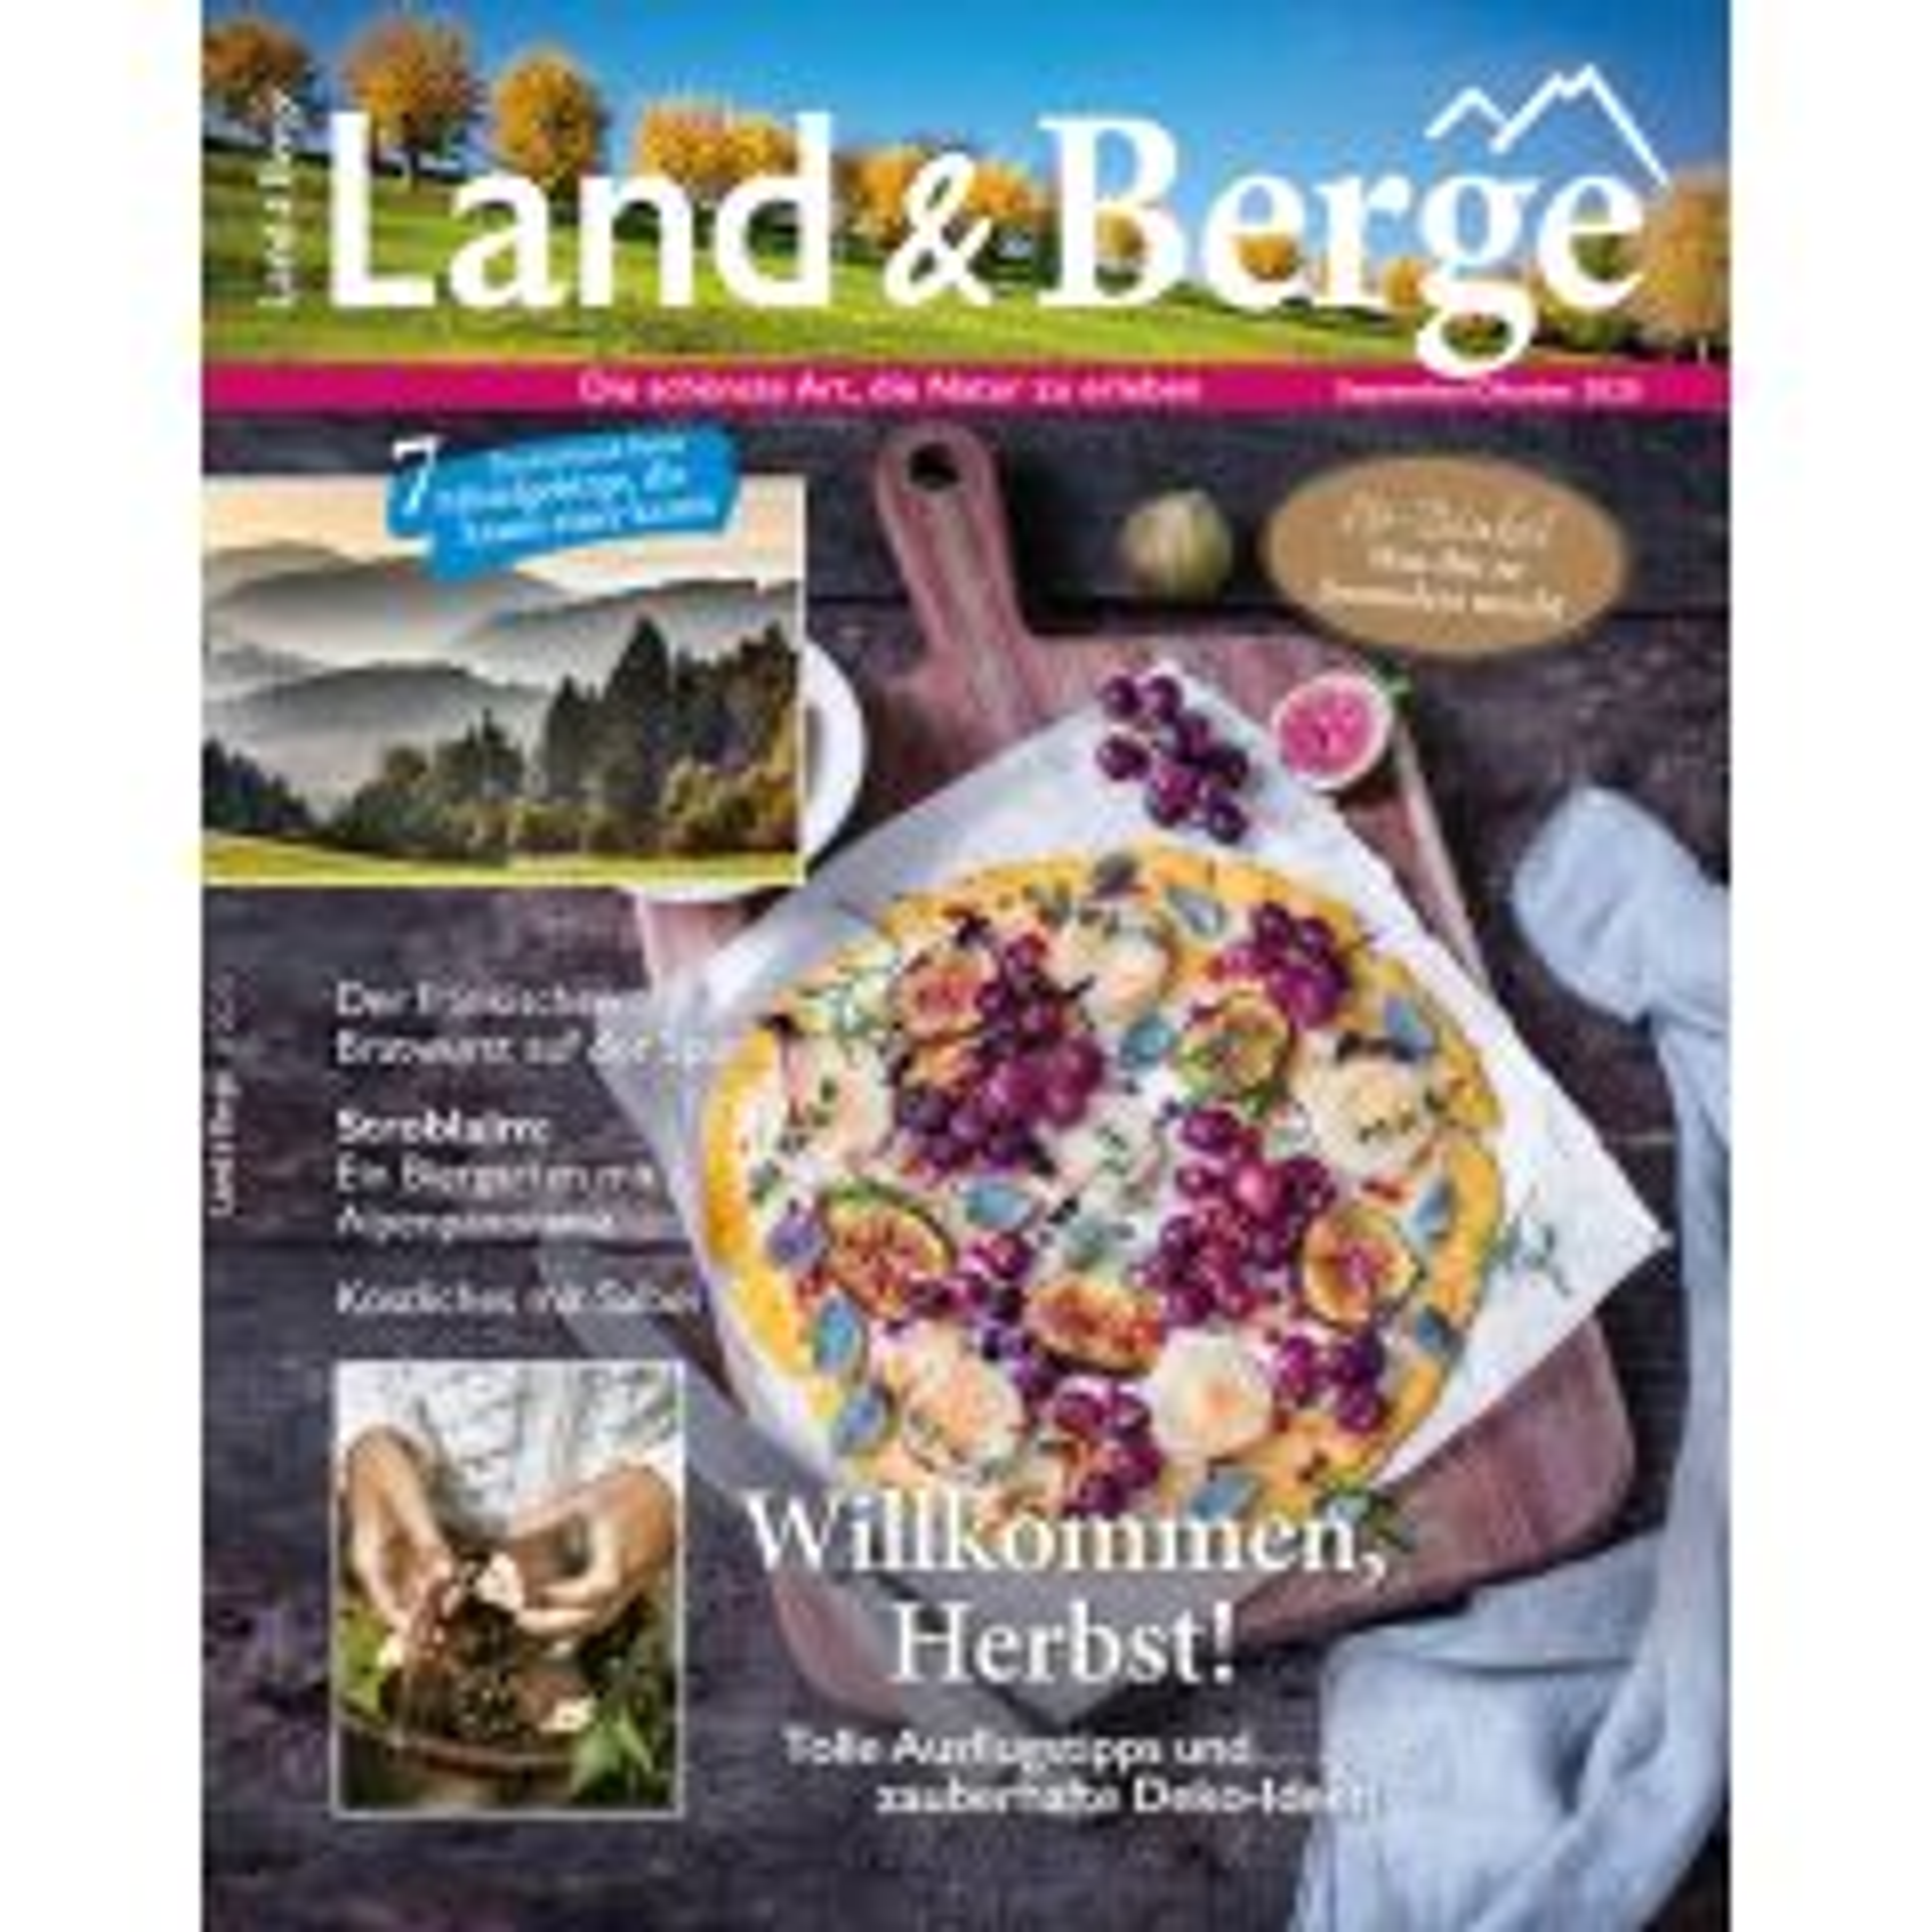 Land & Berge 5/2020